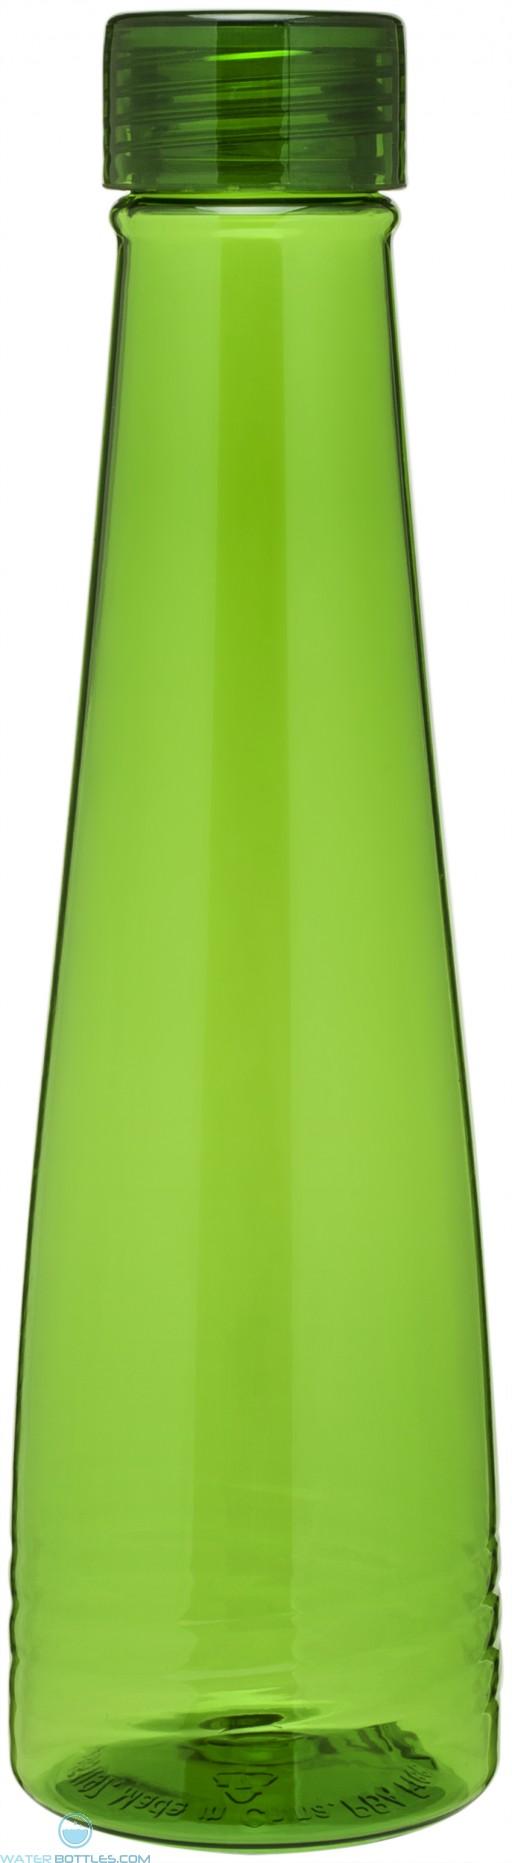 H2Go Splash   20 oz-Green